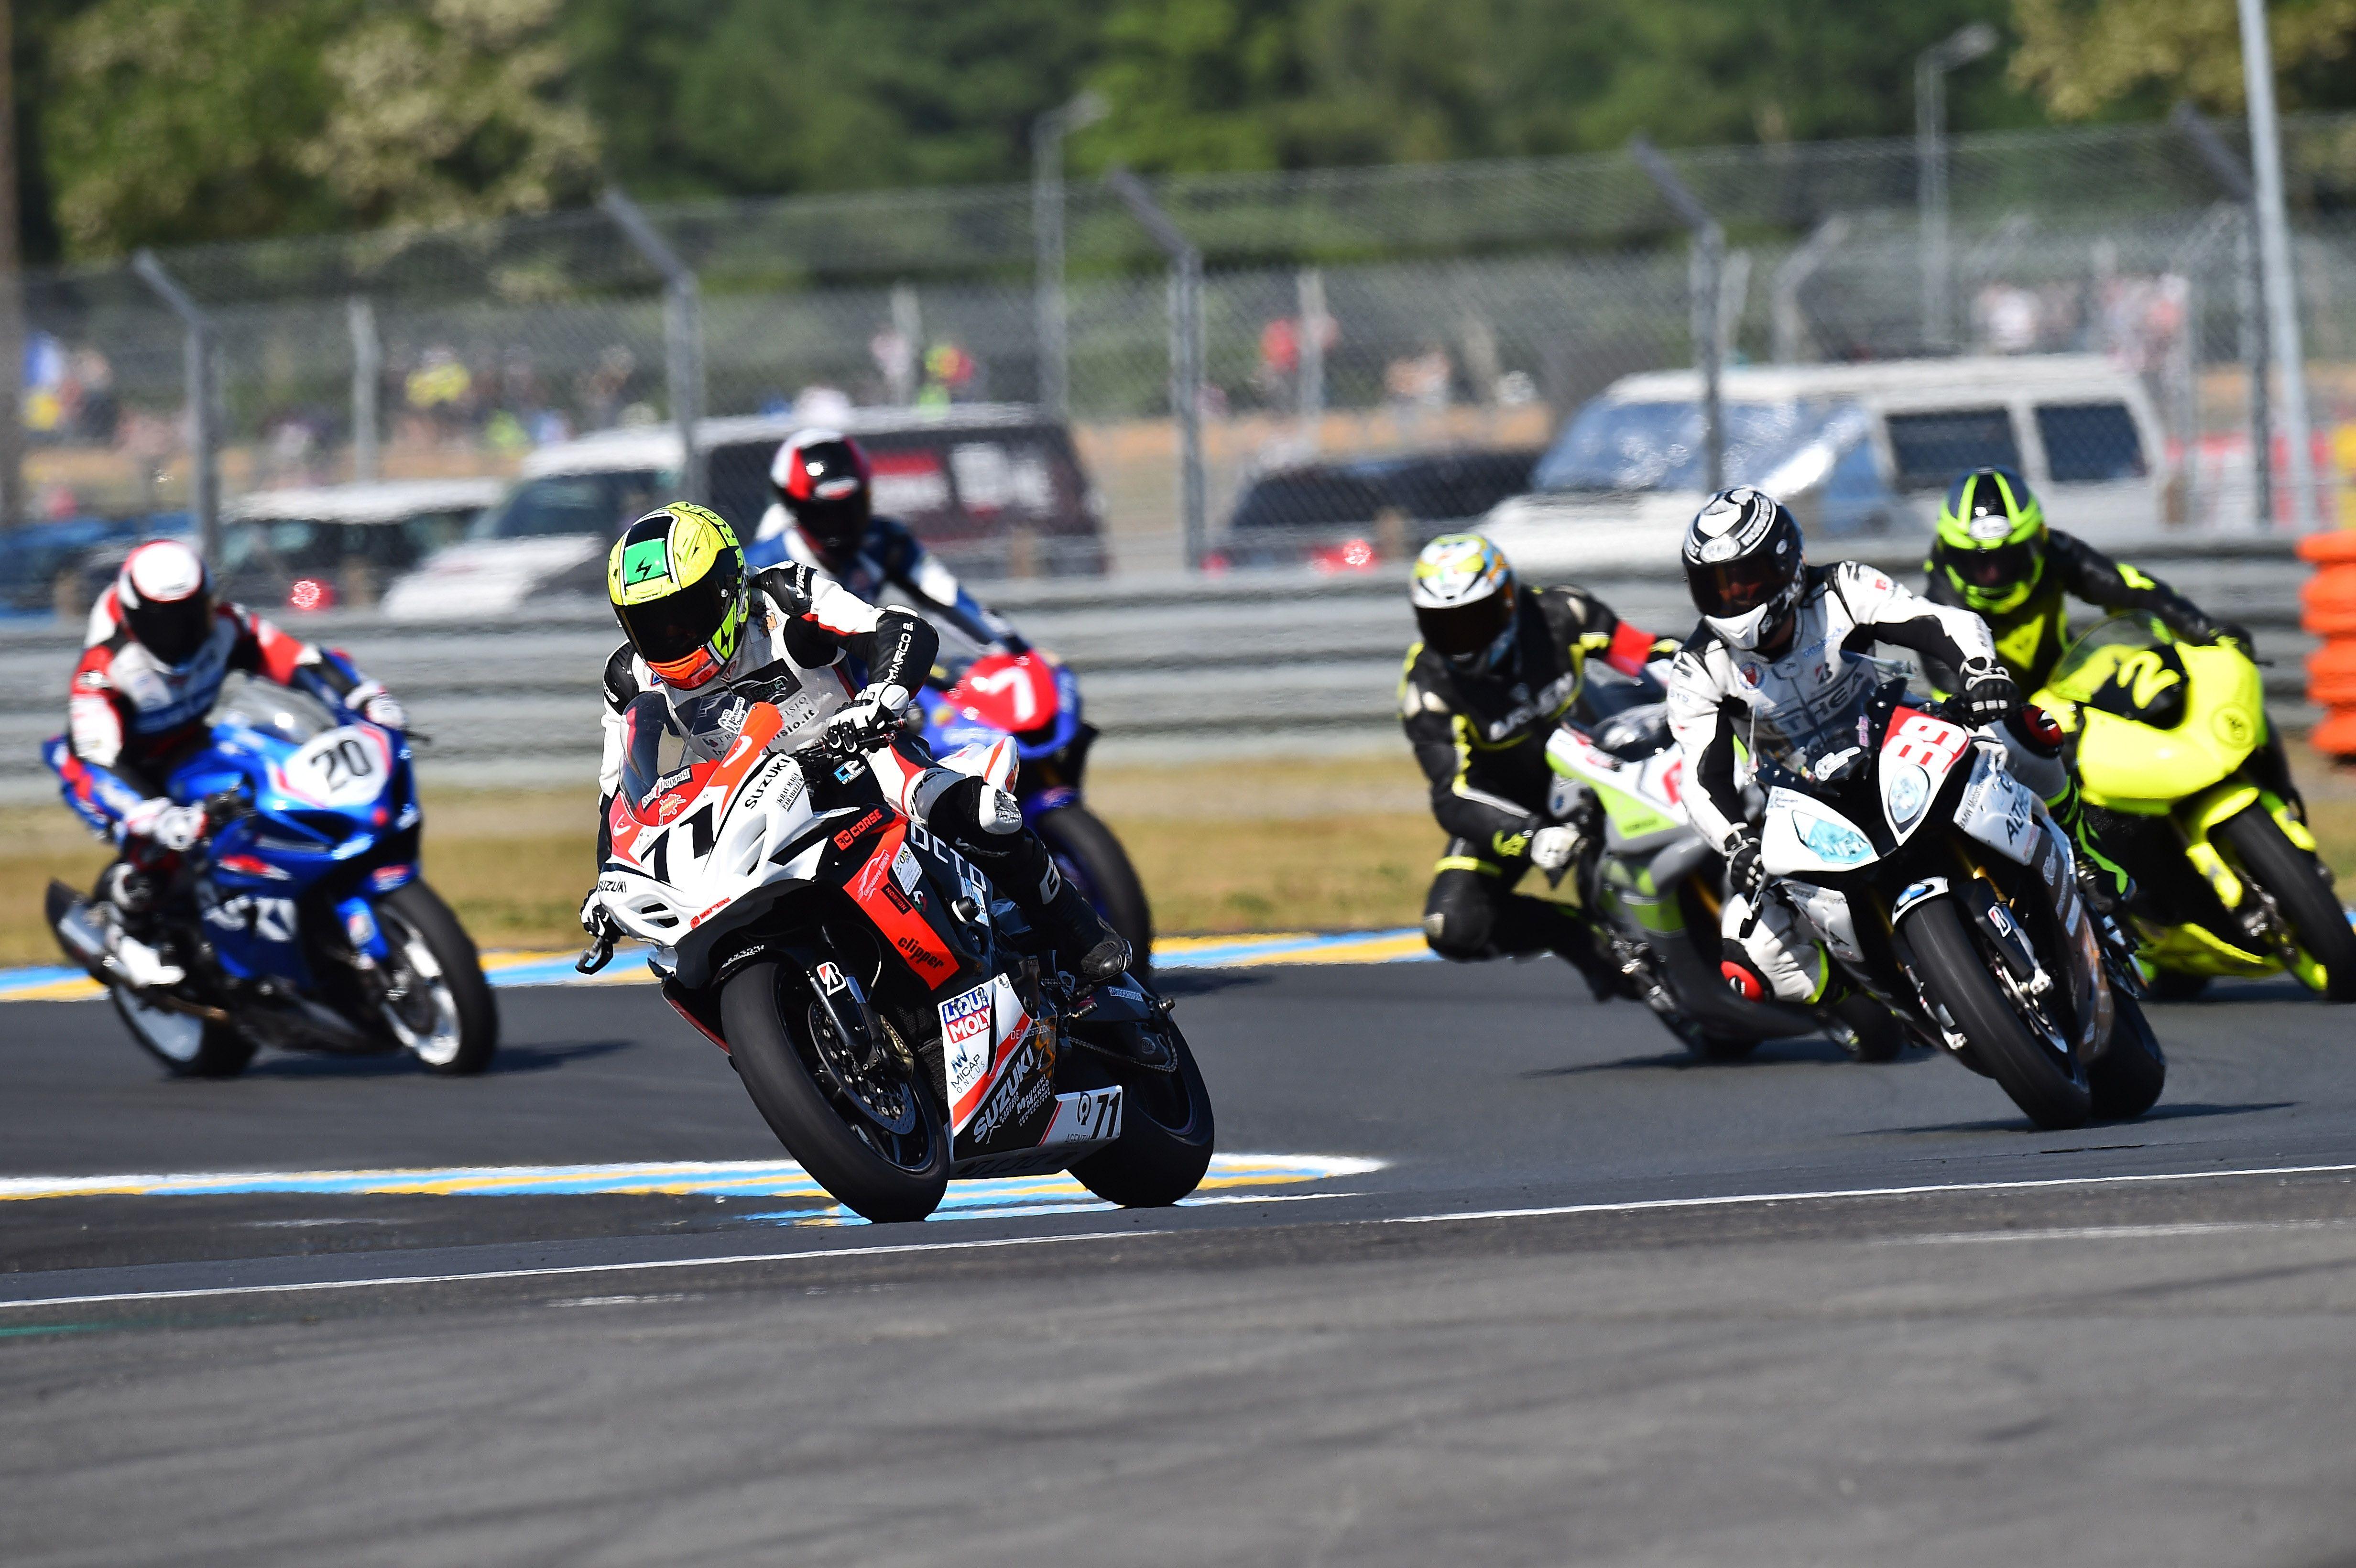 2018 05 GP France 51097.jpg